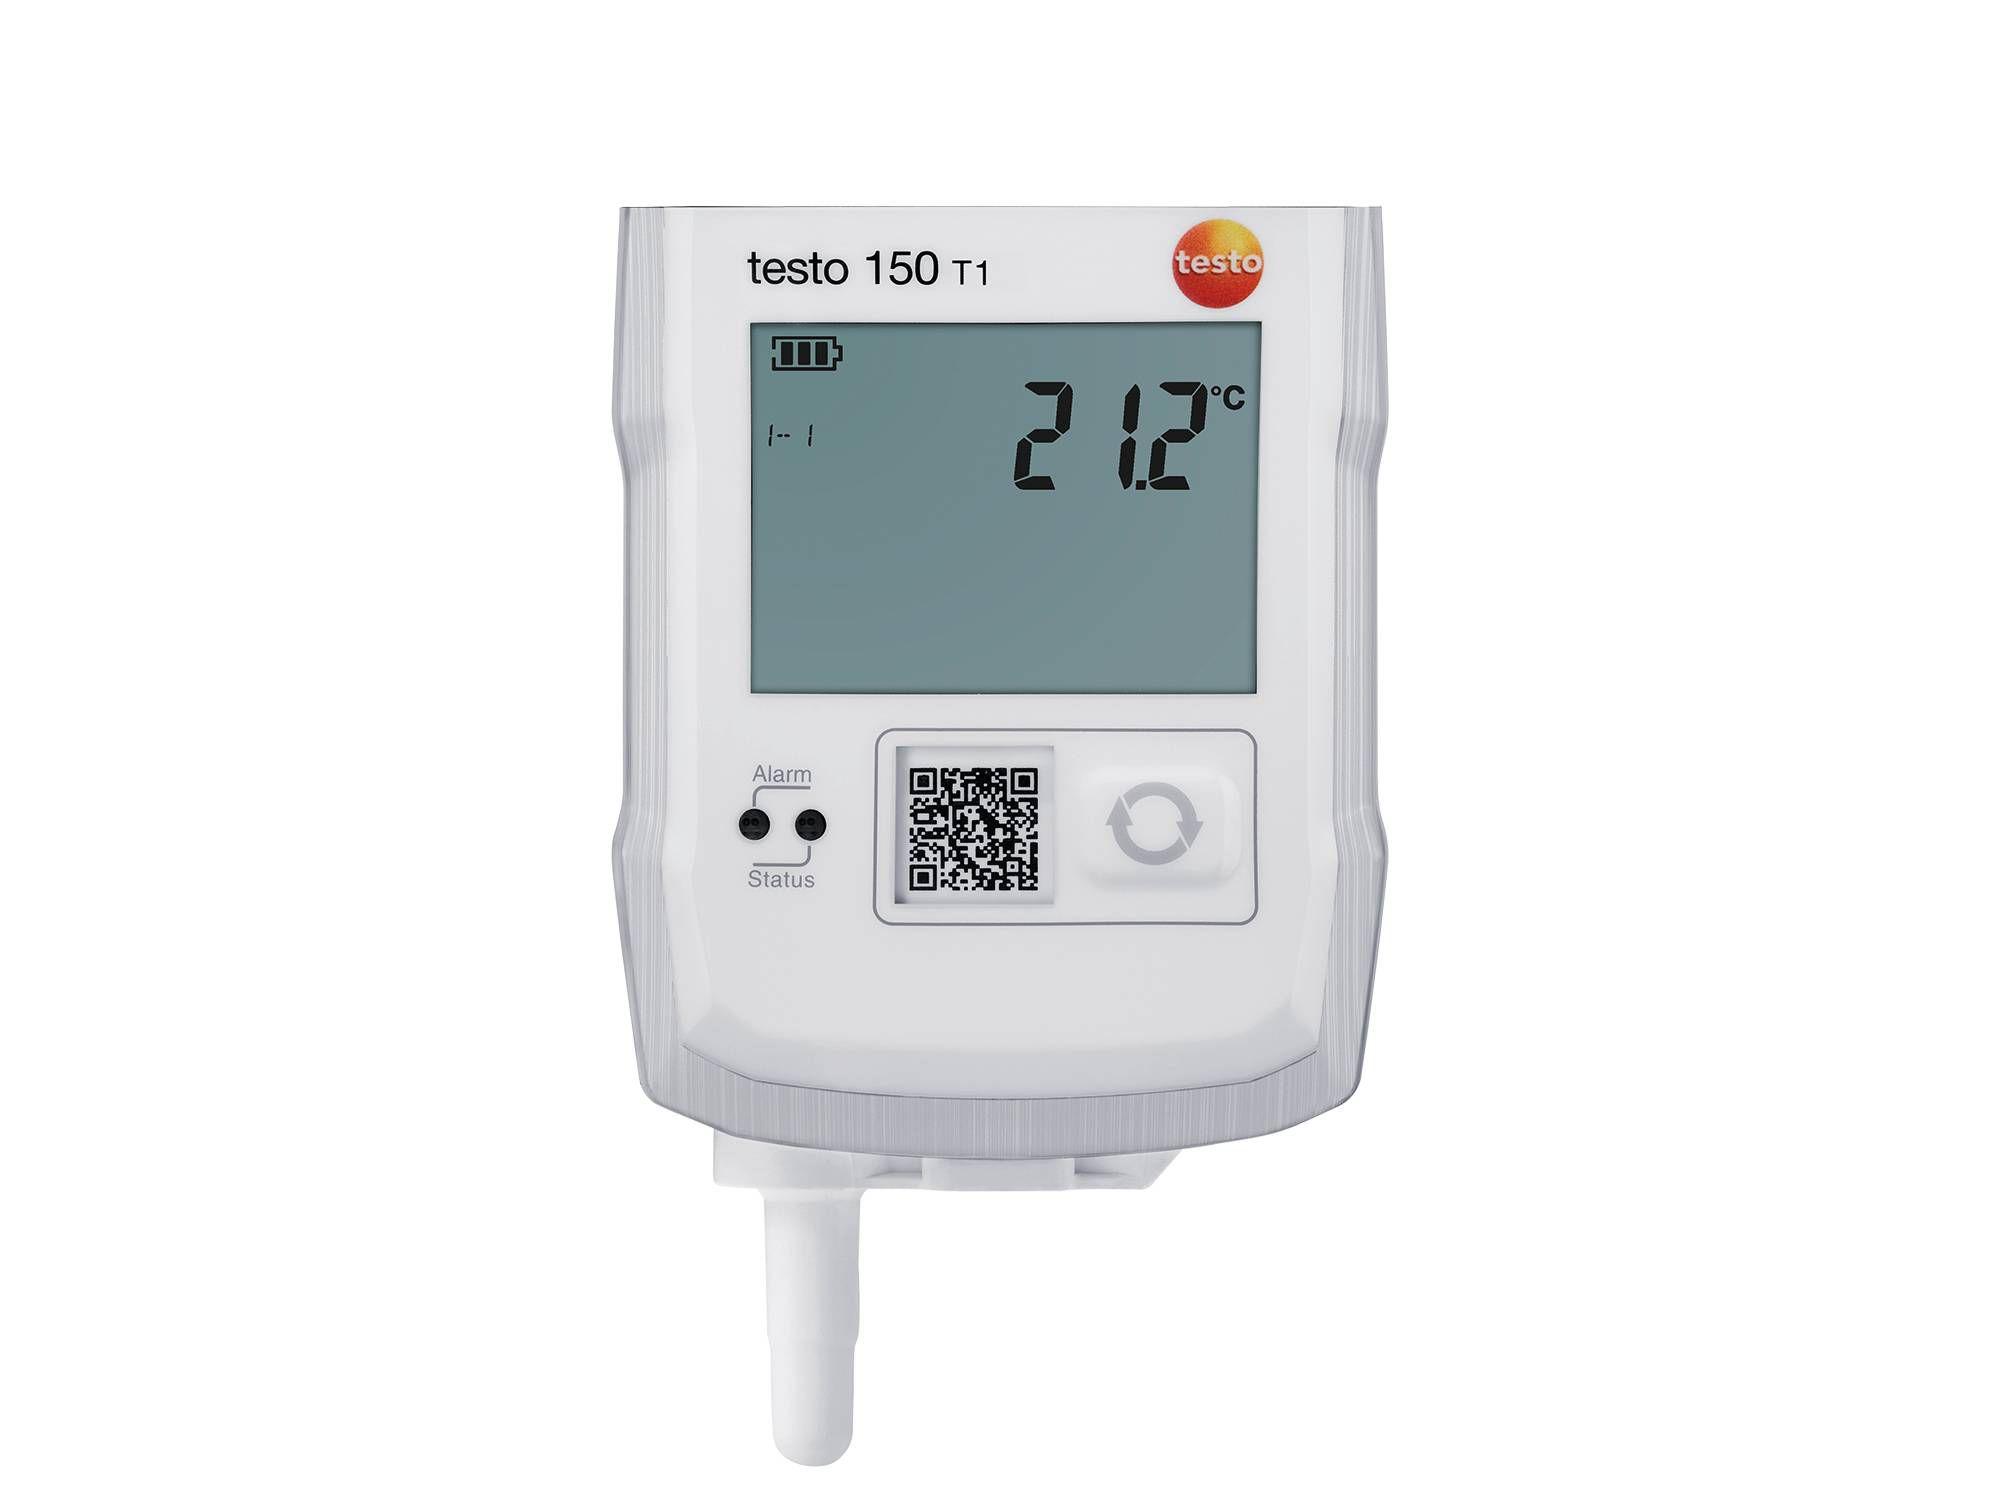 testo 150 T1 data logger module